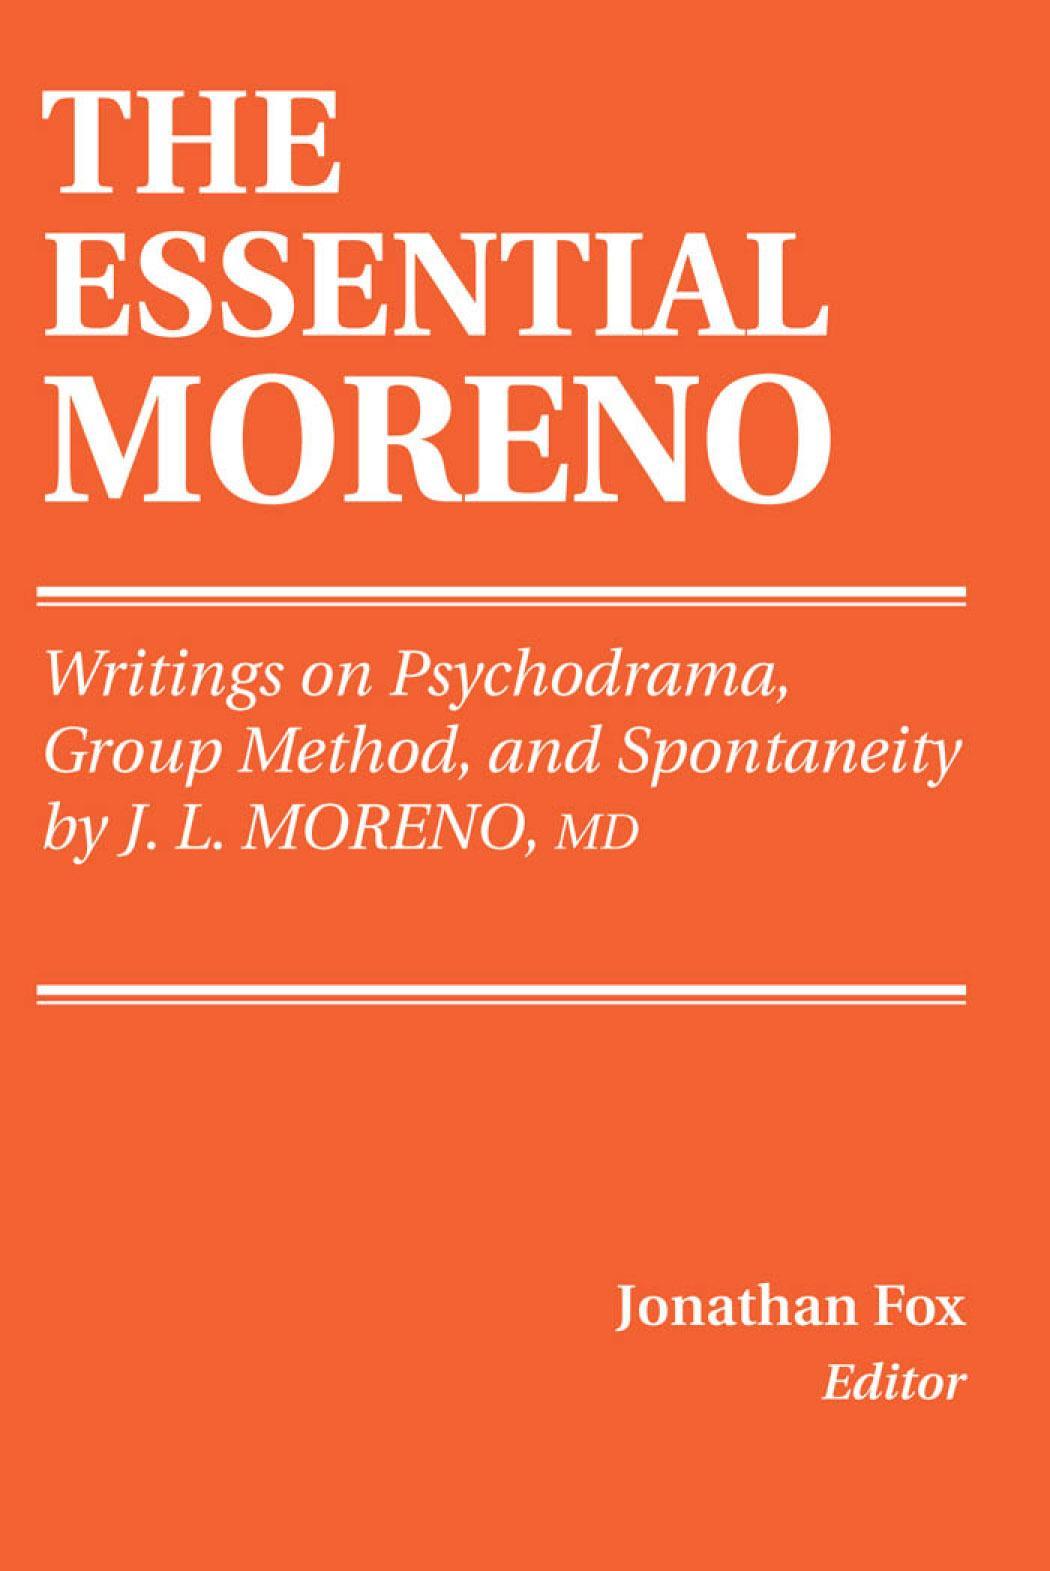 Essential Moreno, The: Writings on Psychodrama, Group Method, and Spontaneity EB9780826197757